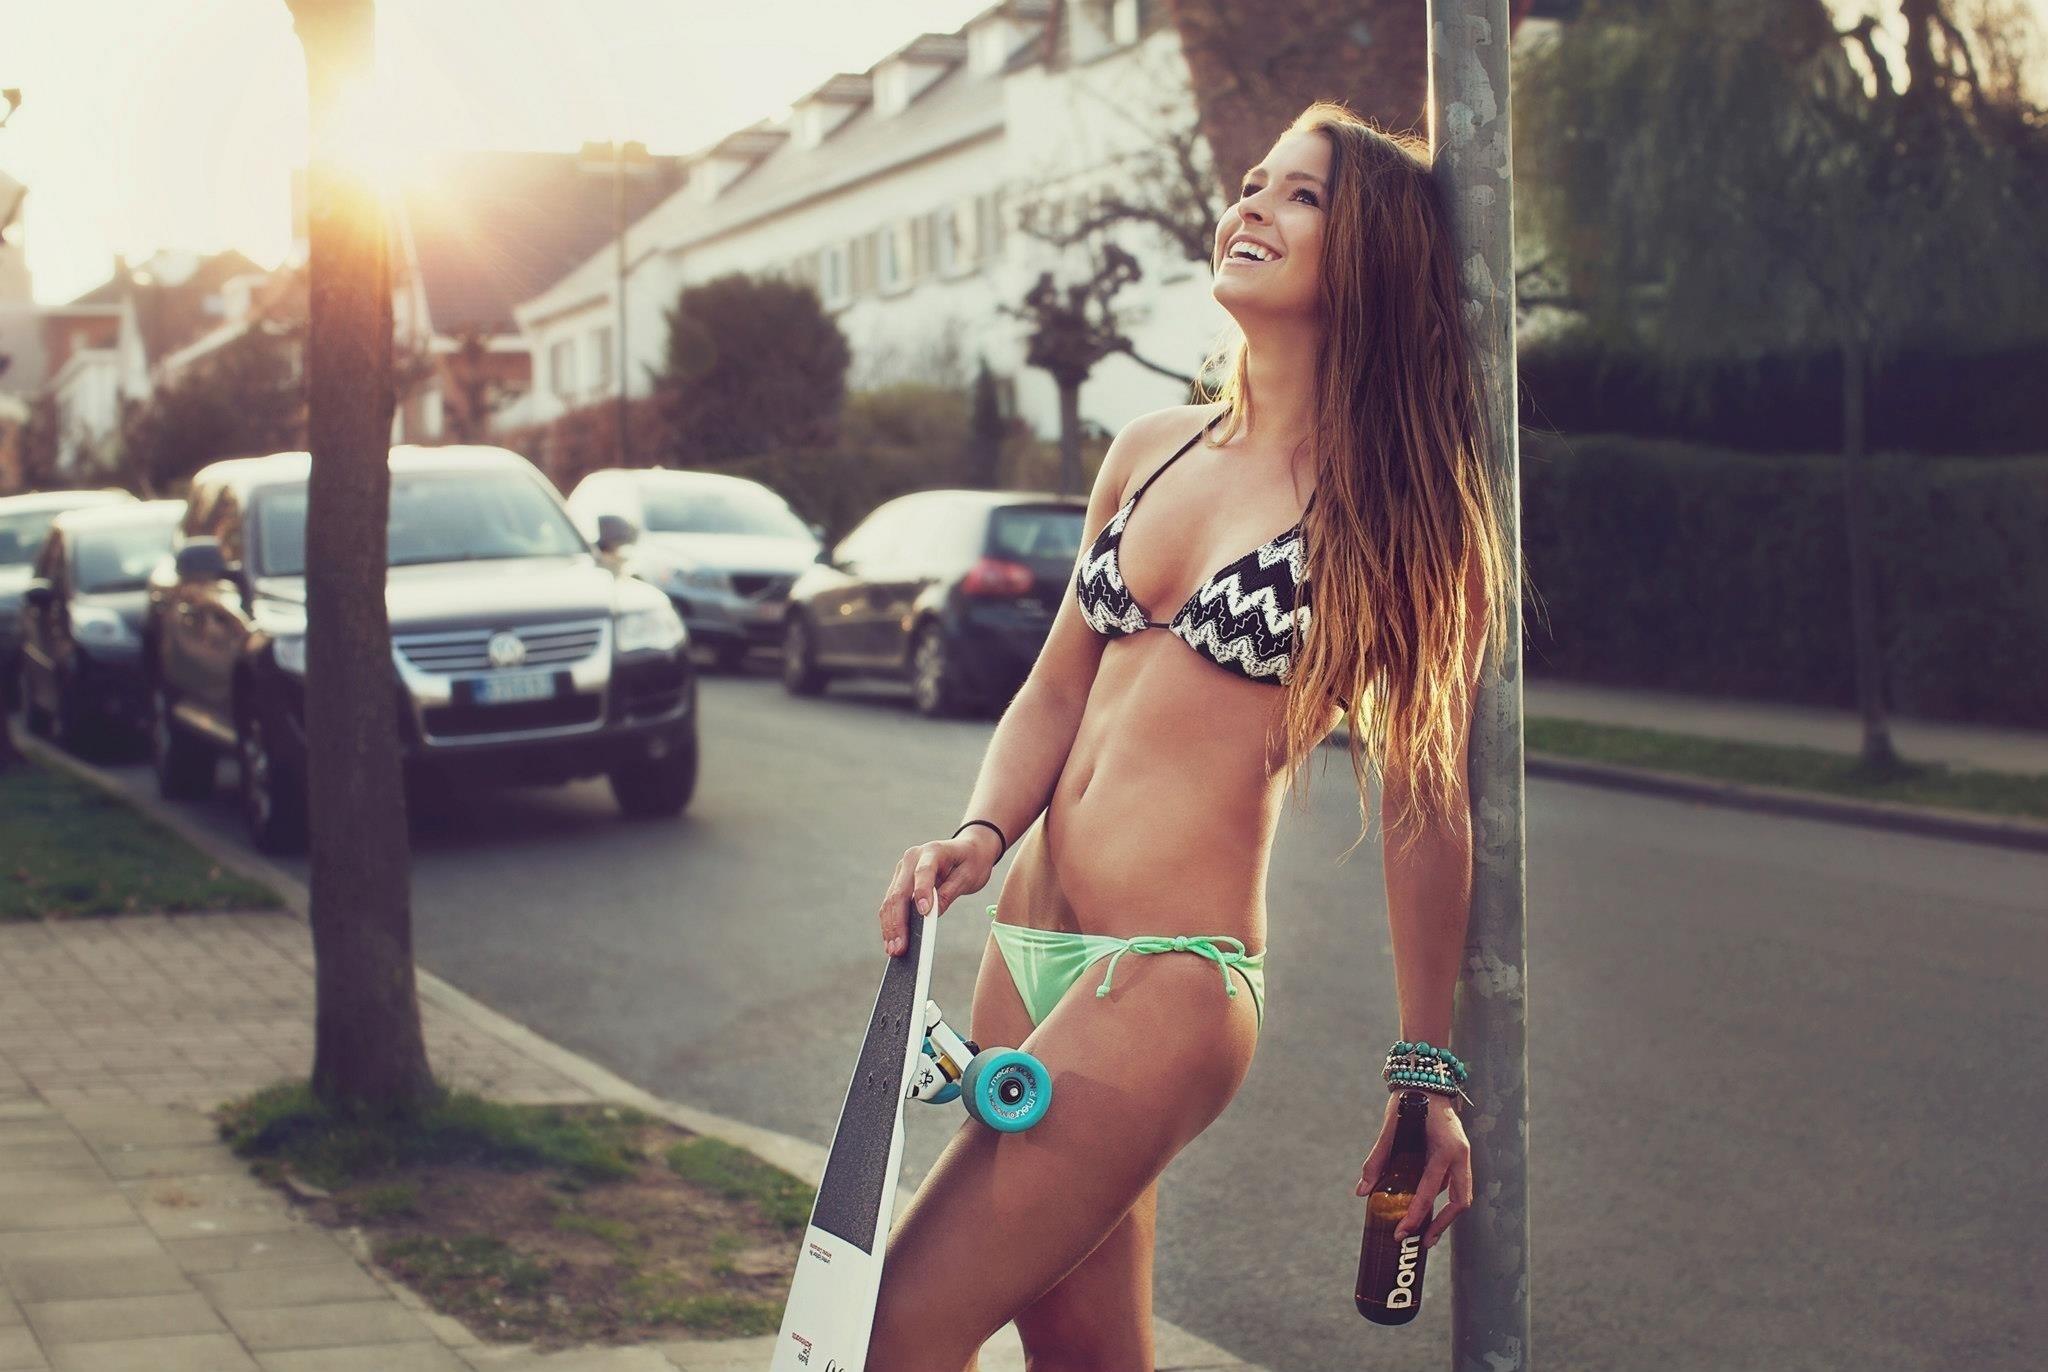 Tattooed chick Mandy Haze taking first time anal outdoors in bikini top № 771731 загрузить